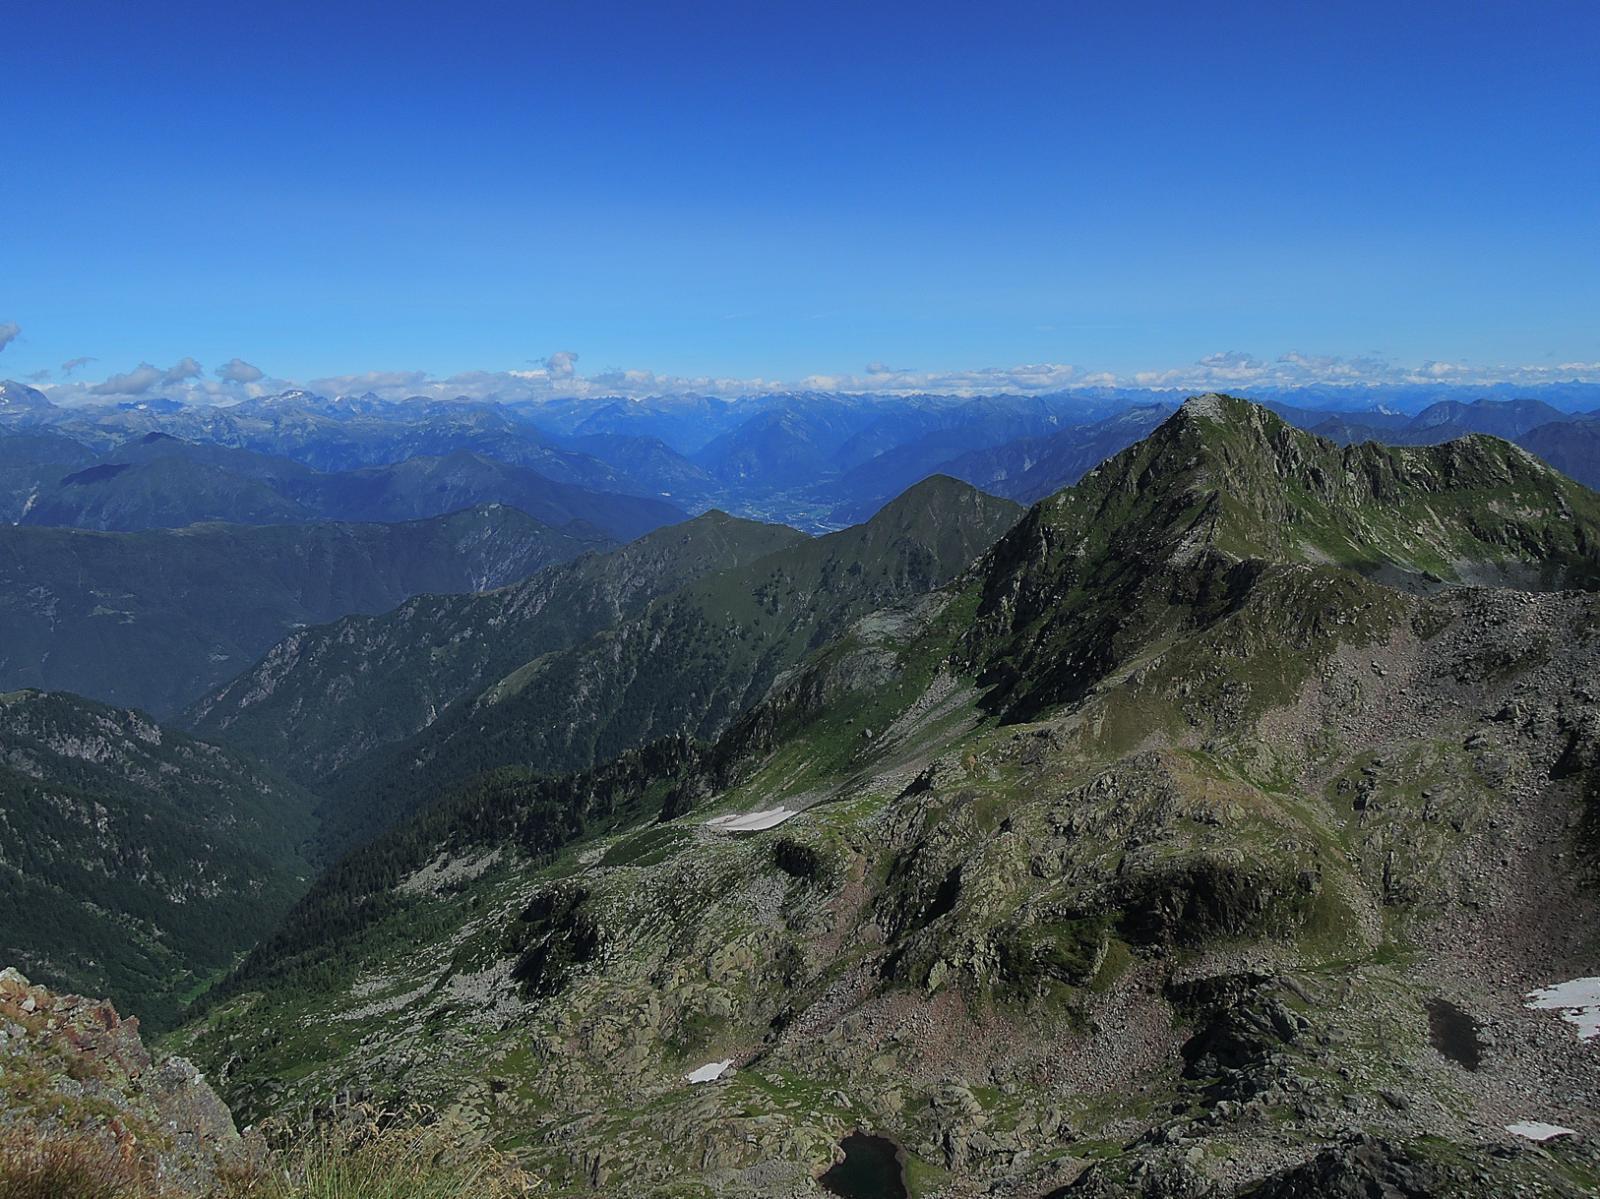 Ossola sullo sfondo, Montagna Ronda a destra